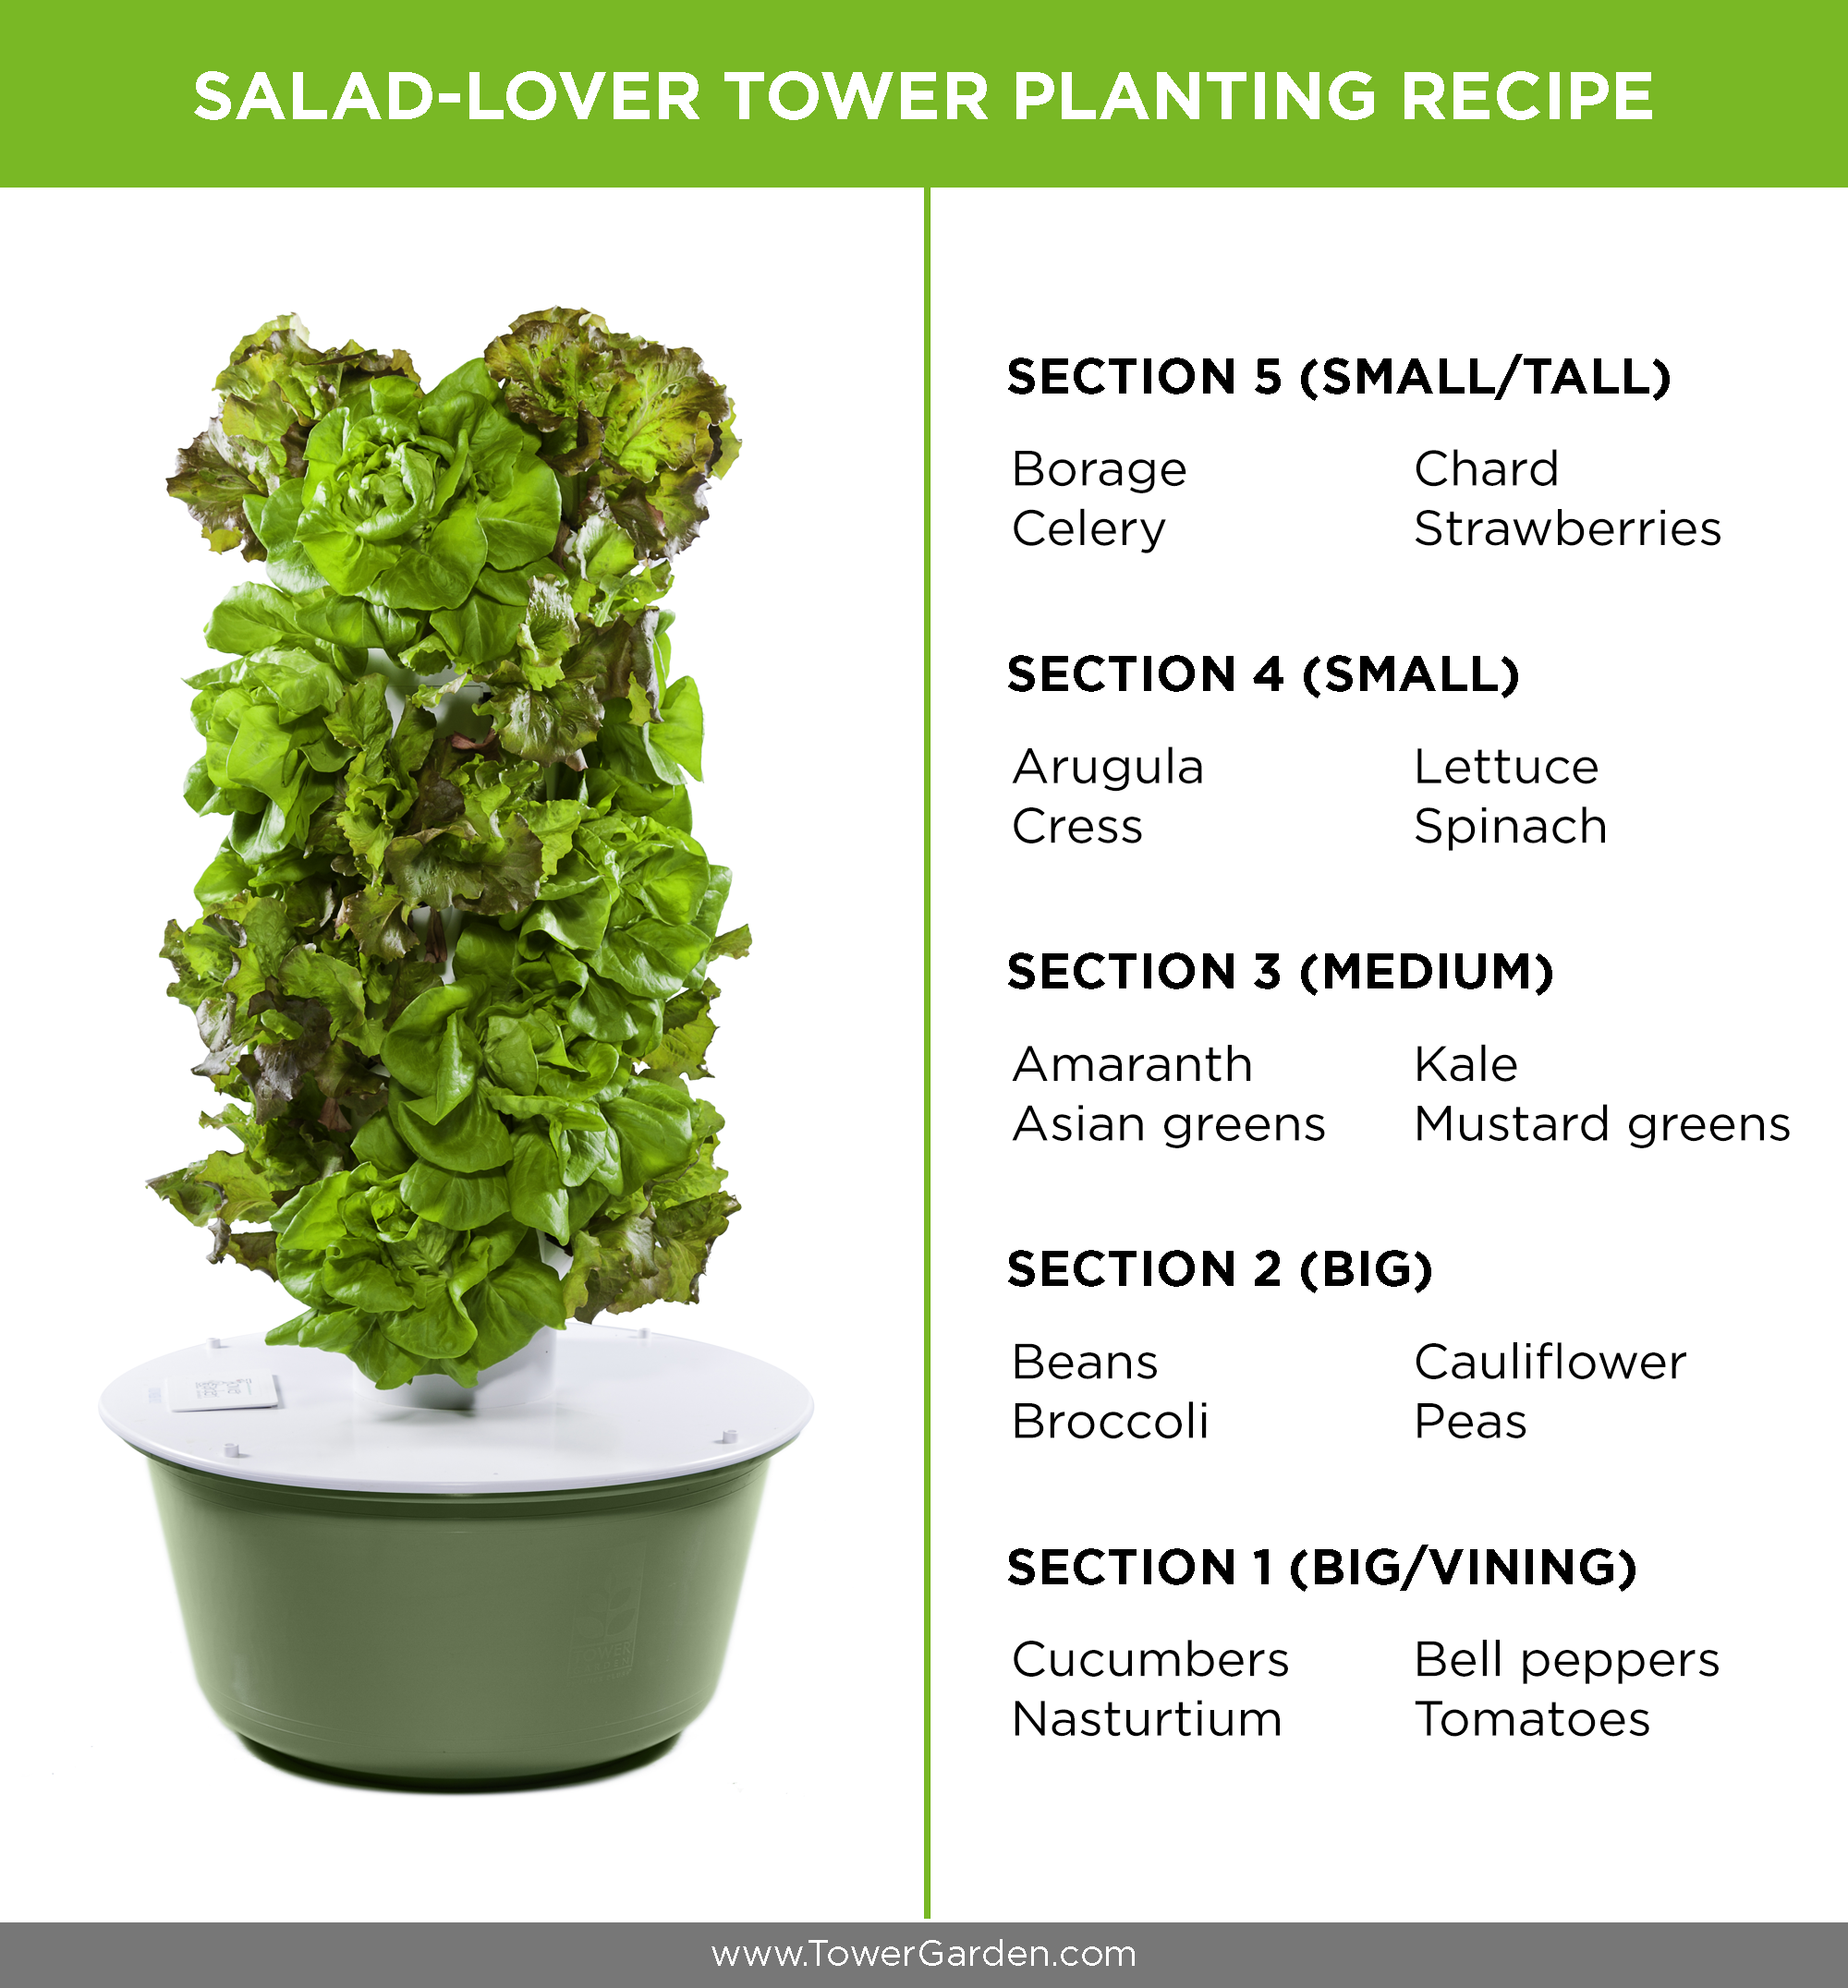 How To Grow Your Own Sensational Salads With No Dirt Gardentower Juiceplus Sonianaje Juice Plus Tower Garden Vertical Vegetable Garden Hydroponic Gardening